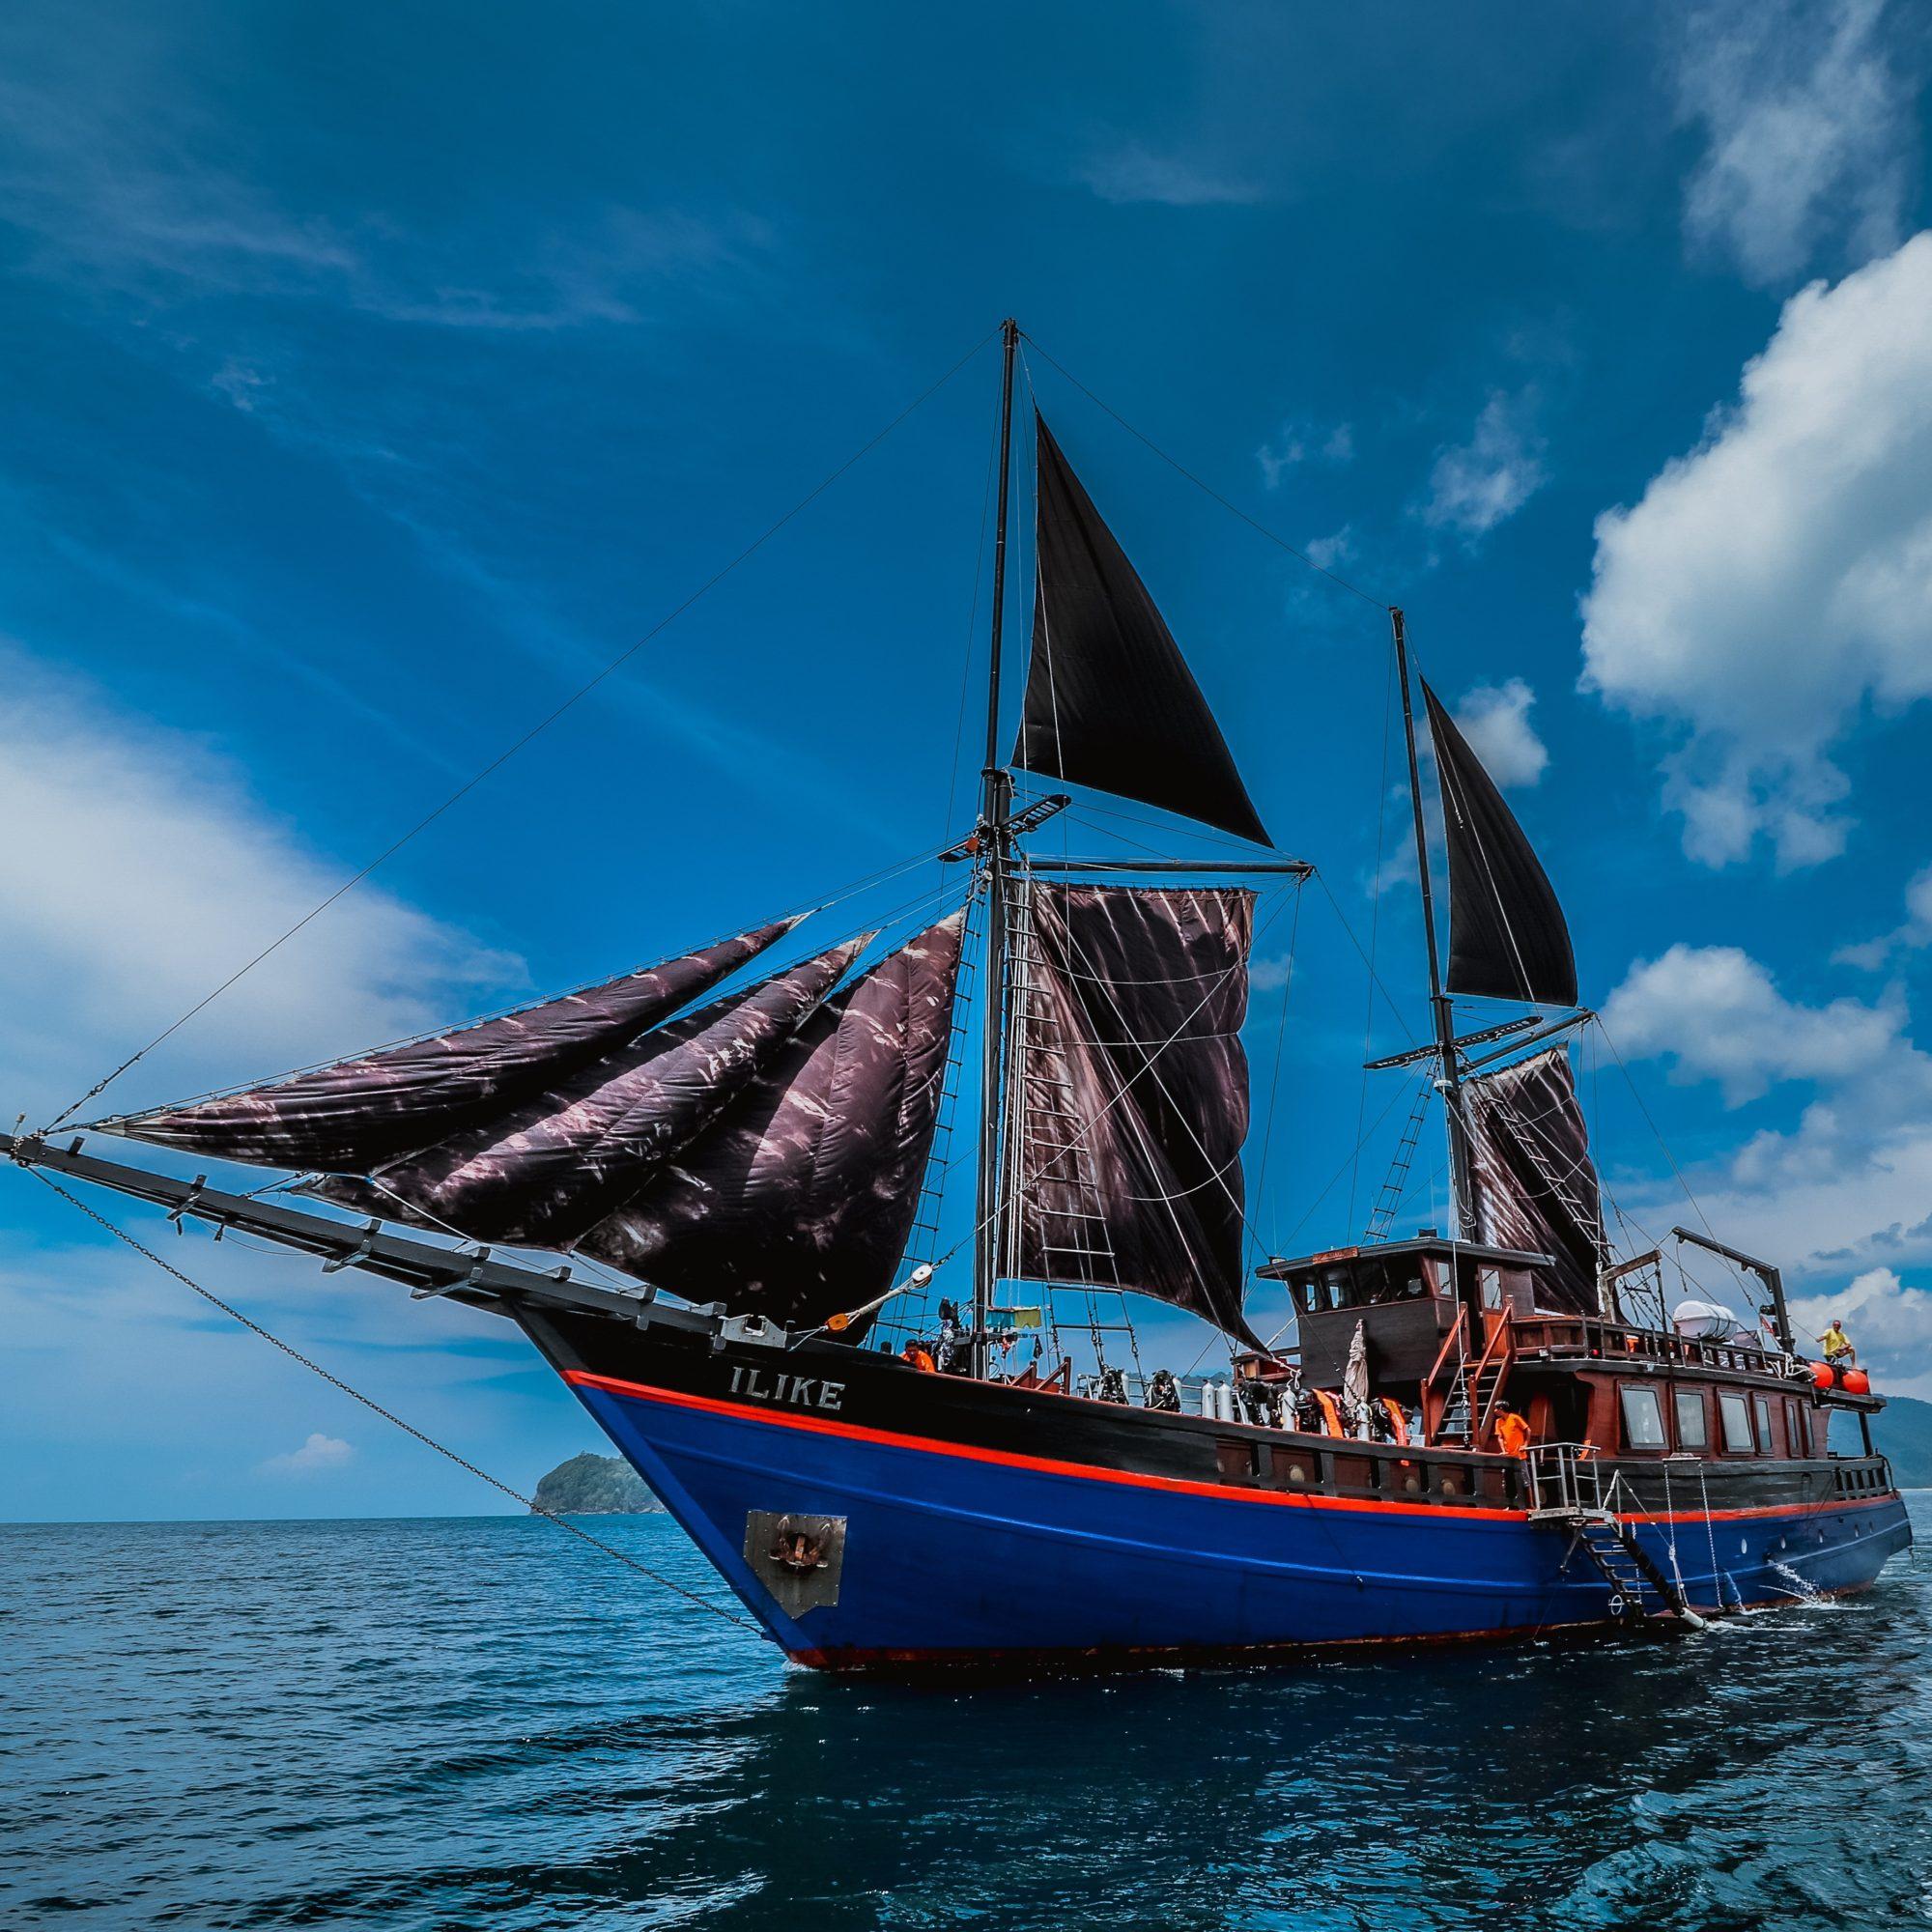 Ilike liveaboard to Kaimana - Ilike boat